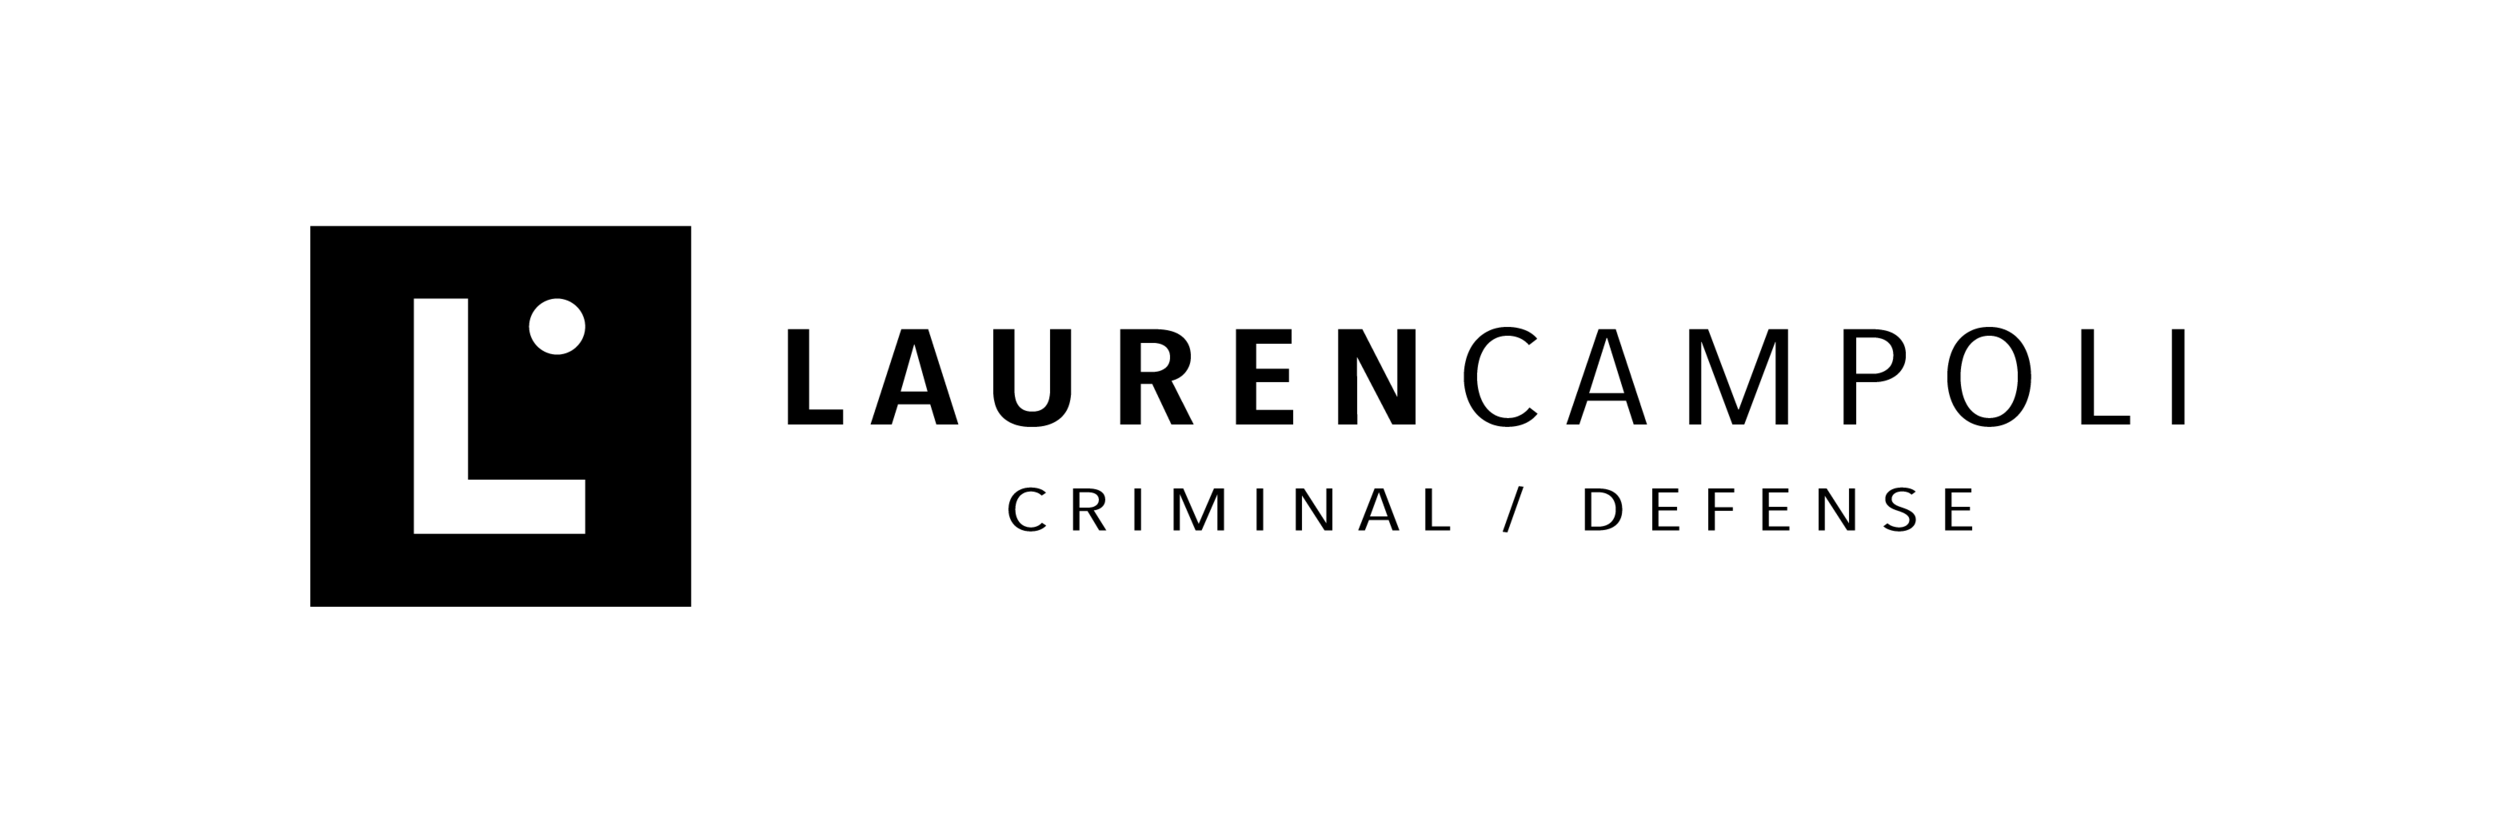 2019_sponsors_blk_LaurenCampoli.png